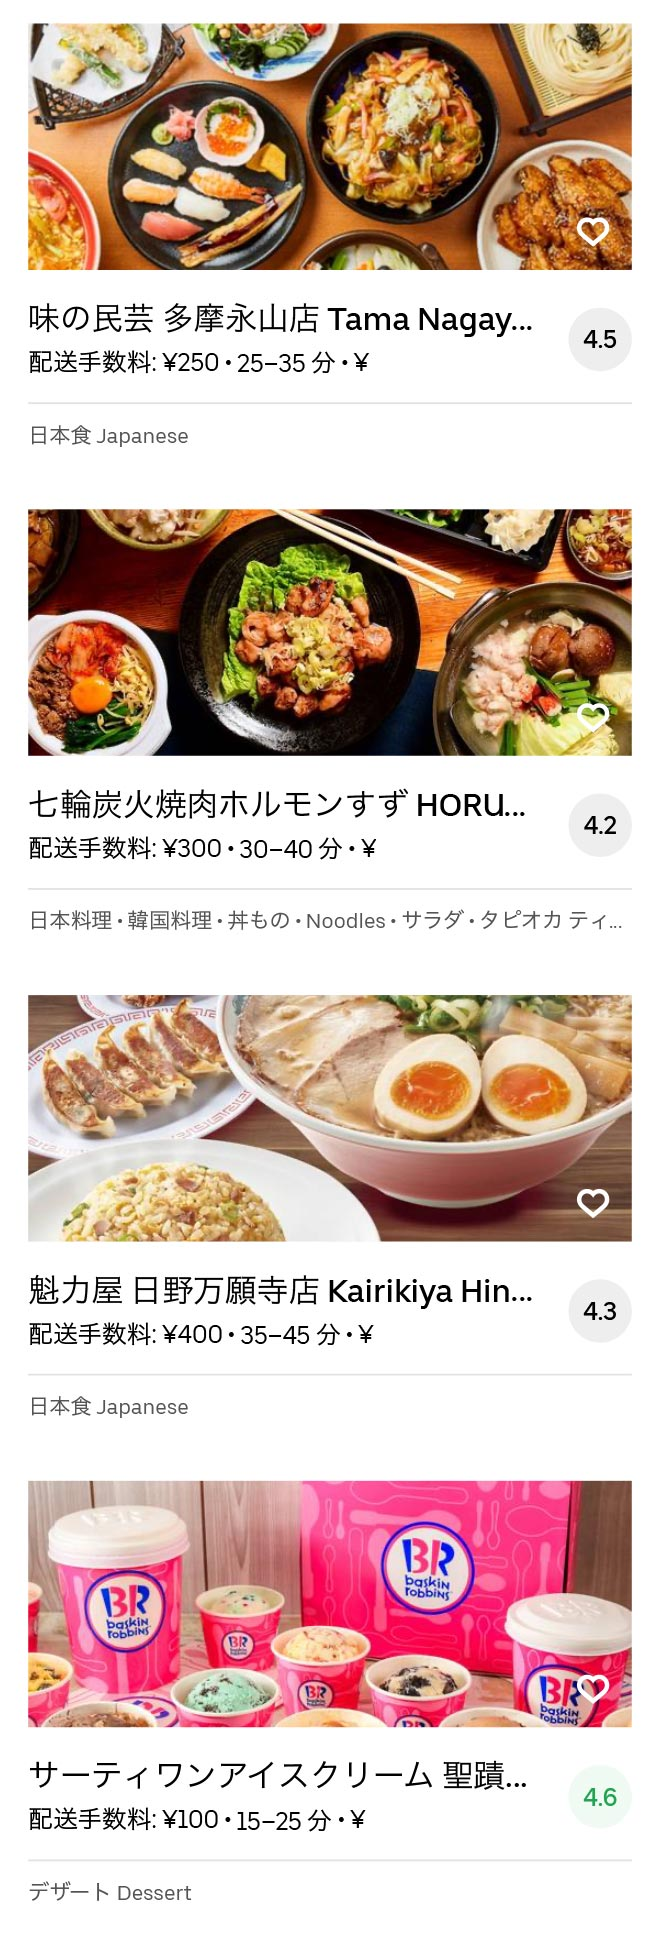 Seiseki menu 2007 07